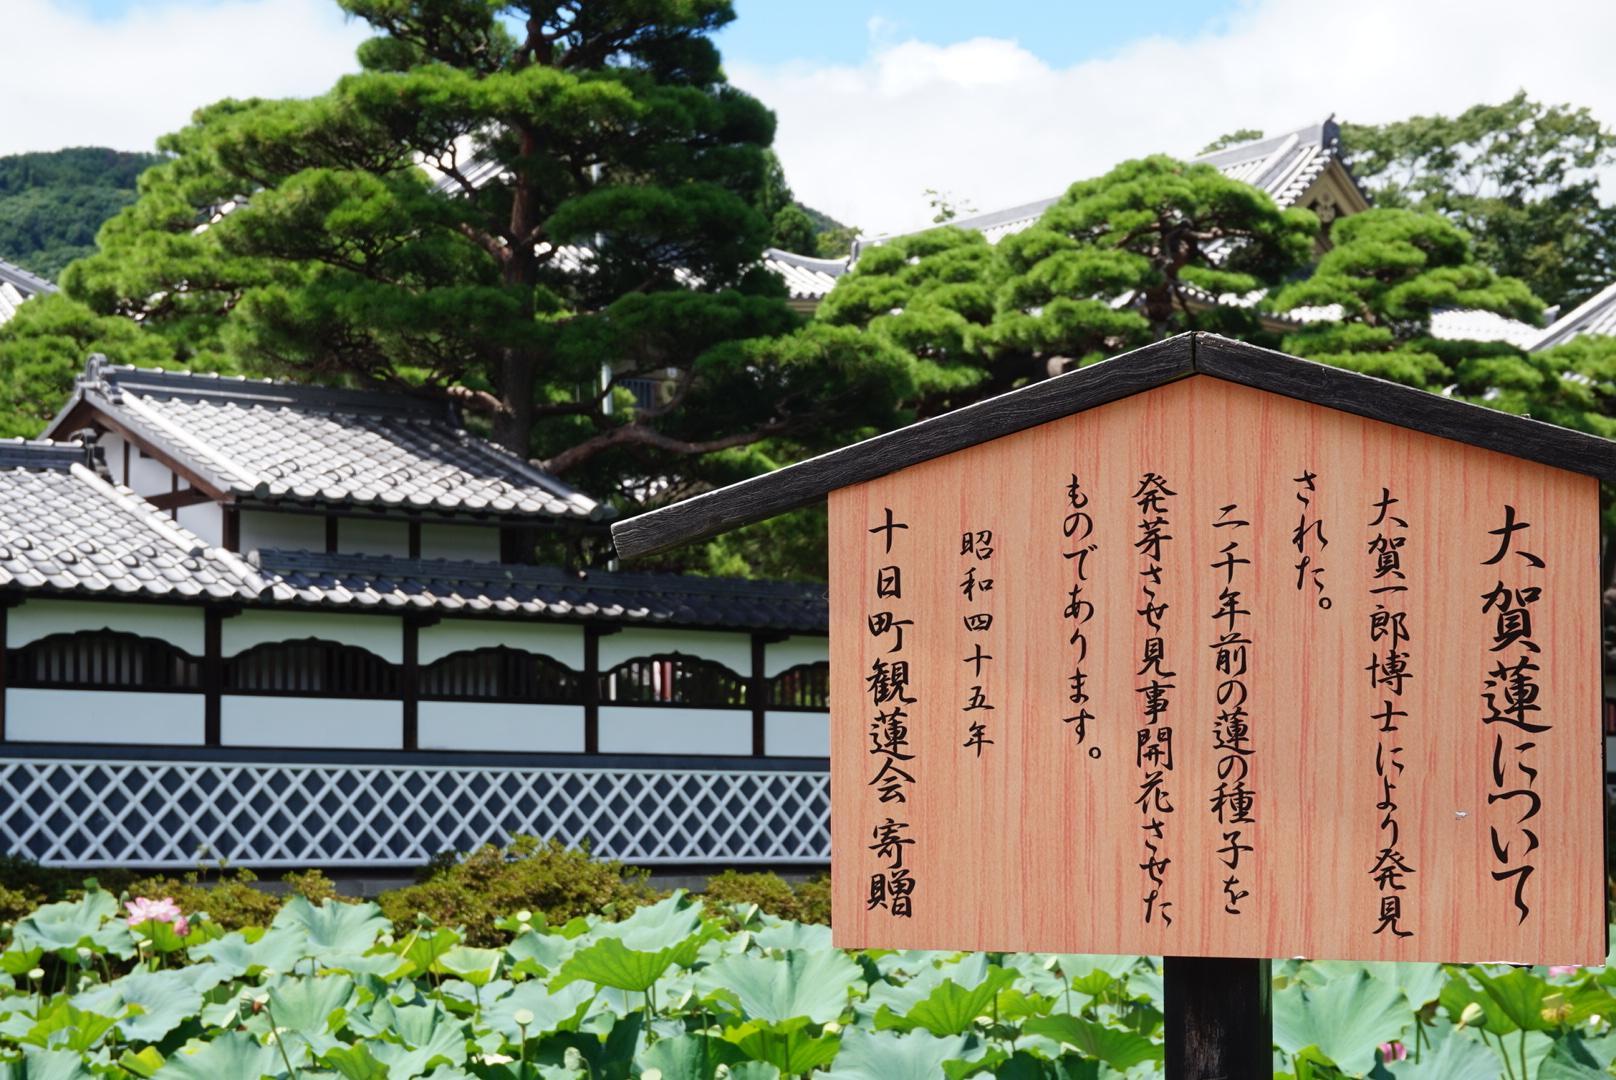 善光寺の歴史